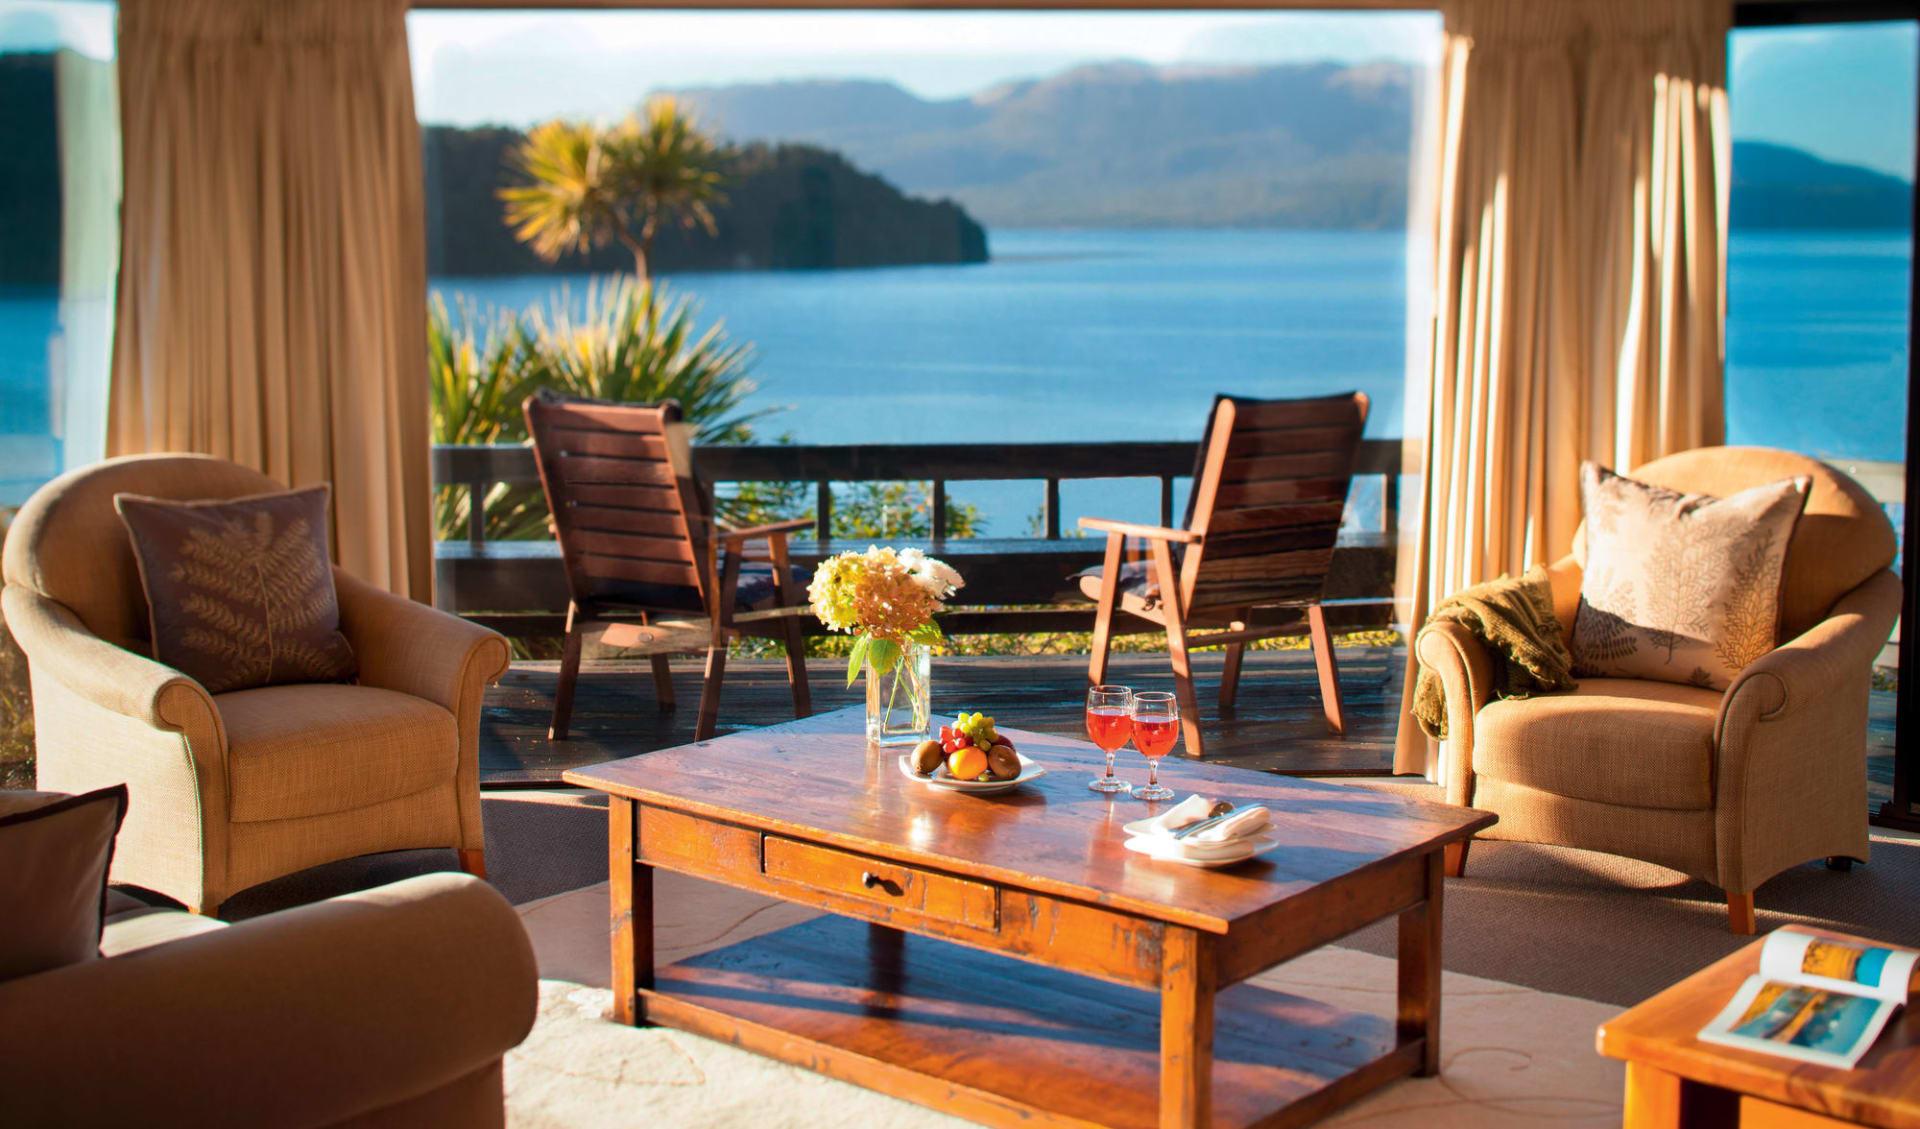 Solitaire Lodge in Rotorua:  Solitaire Lodge - Solitaire Suite